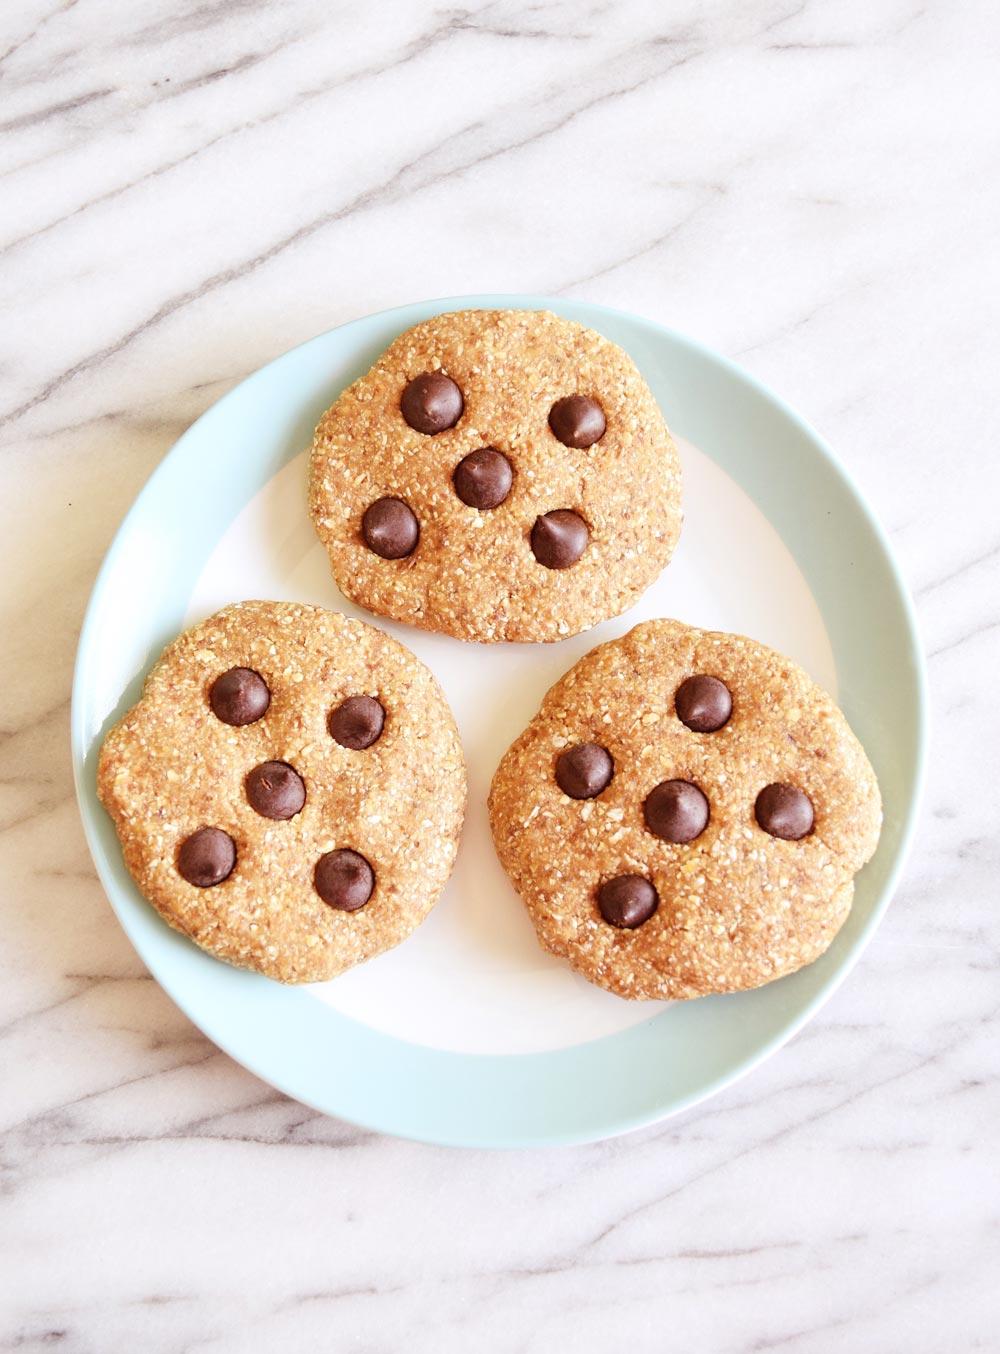 Vegan No Bake Chocolate Chip Cookies